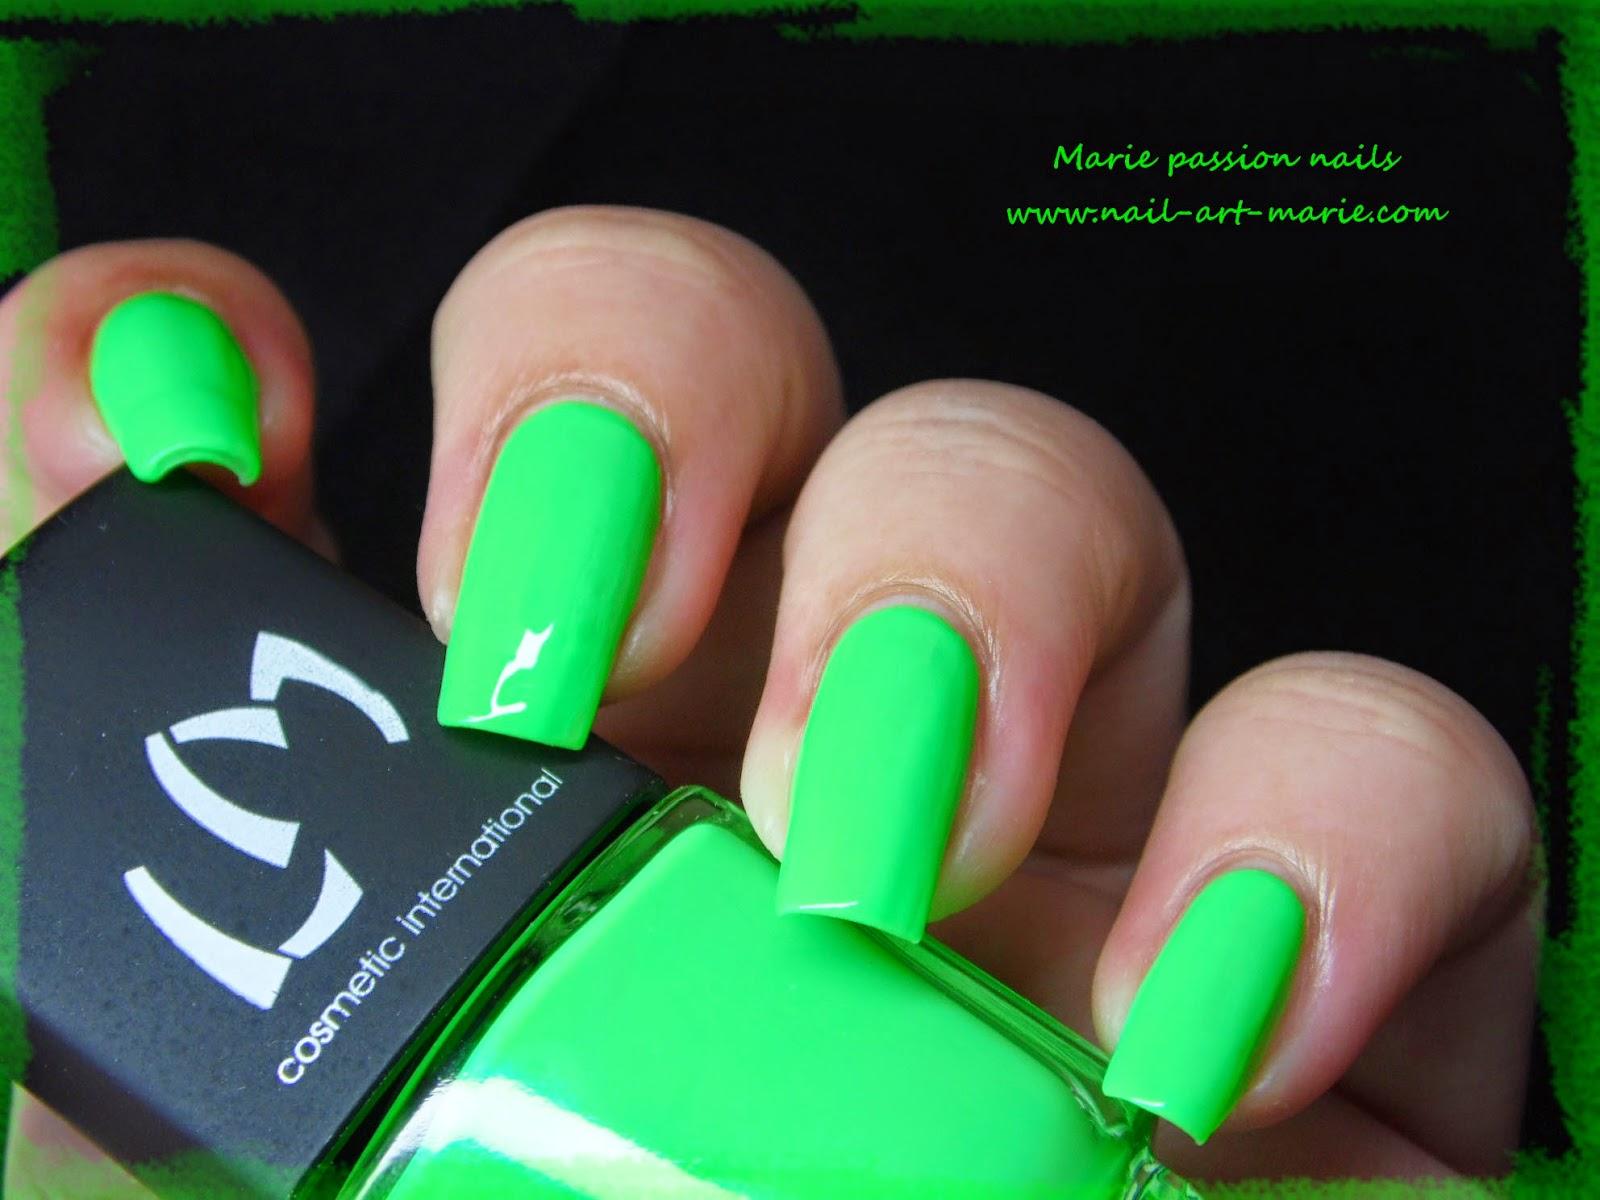 LM Cosmetic Duchamp6